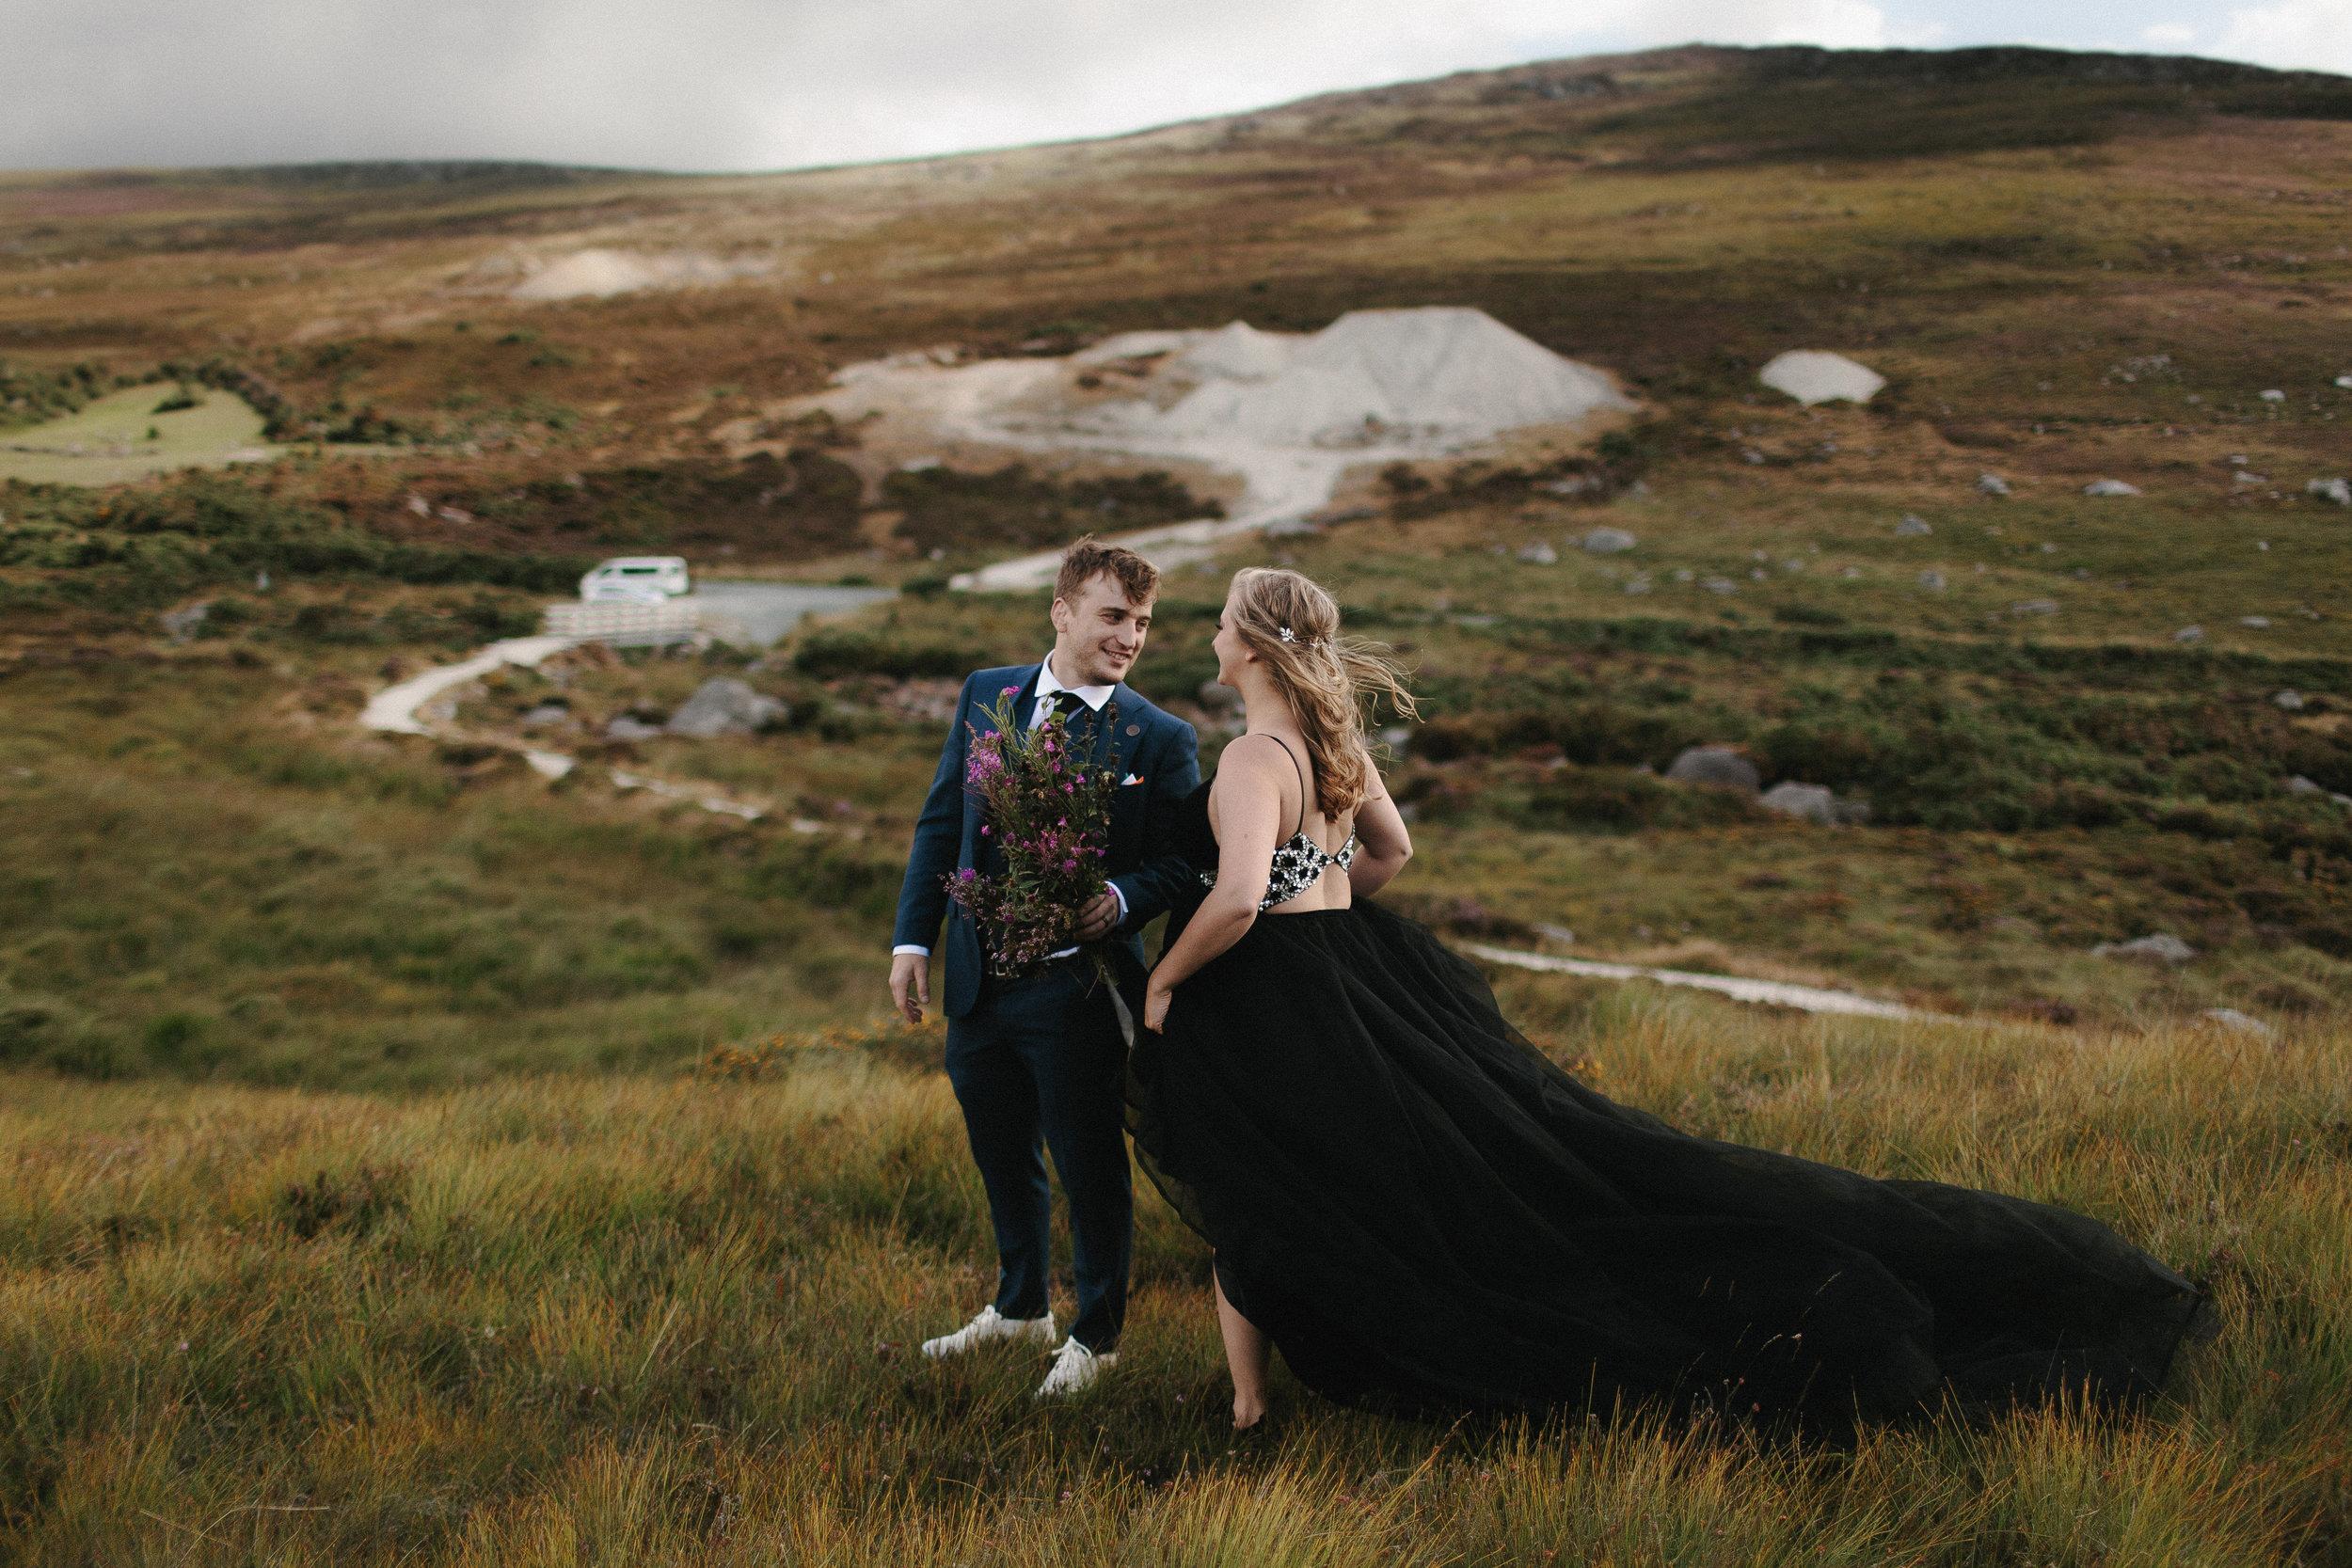 ireland_elopement_black_wedding_dress_wicklow_glendalough_athy_st_kevins_way_1315.jpg